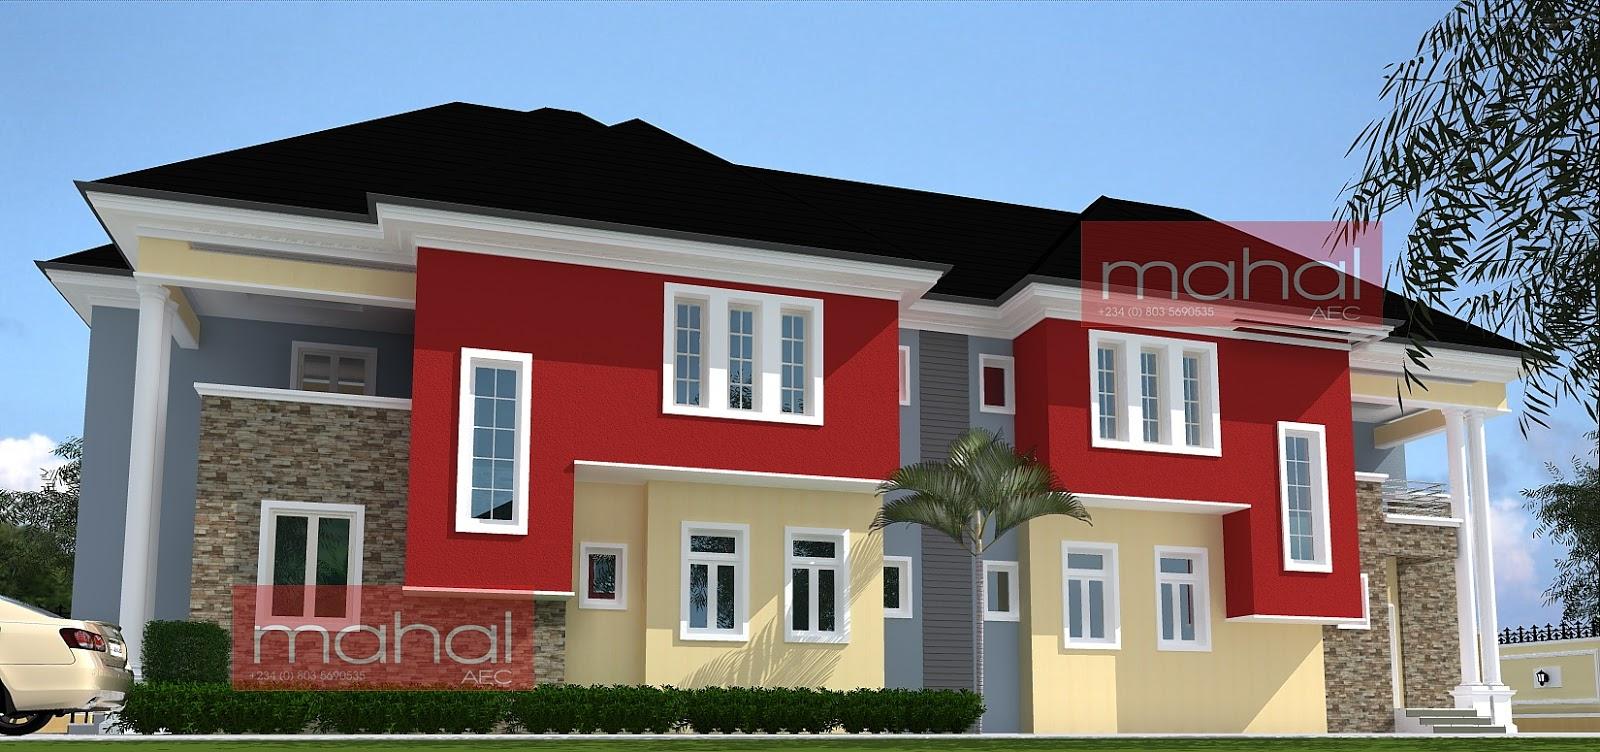 Contemporary Nigerian Residential Architecture: P. Uwa ...